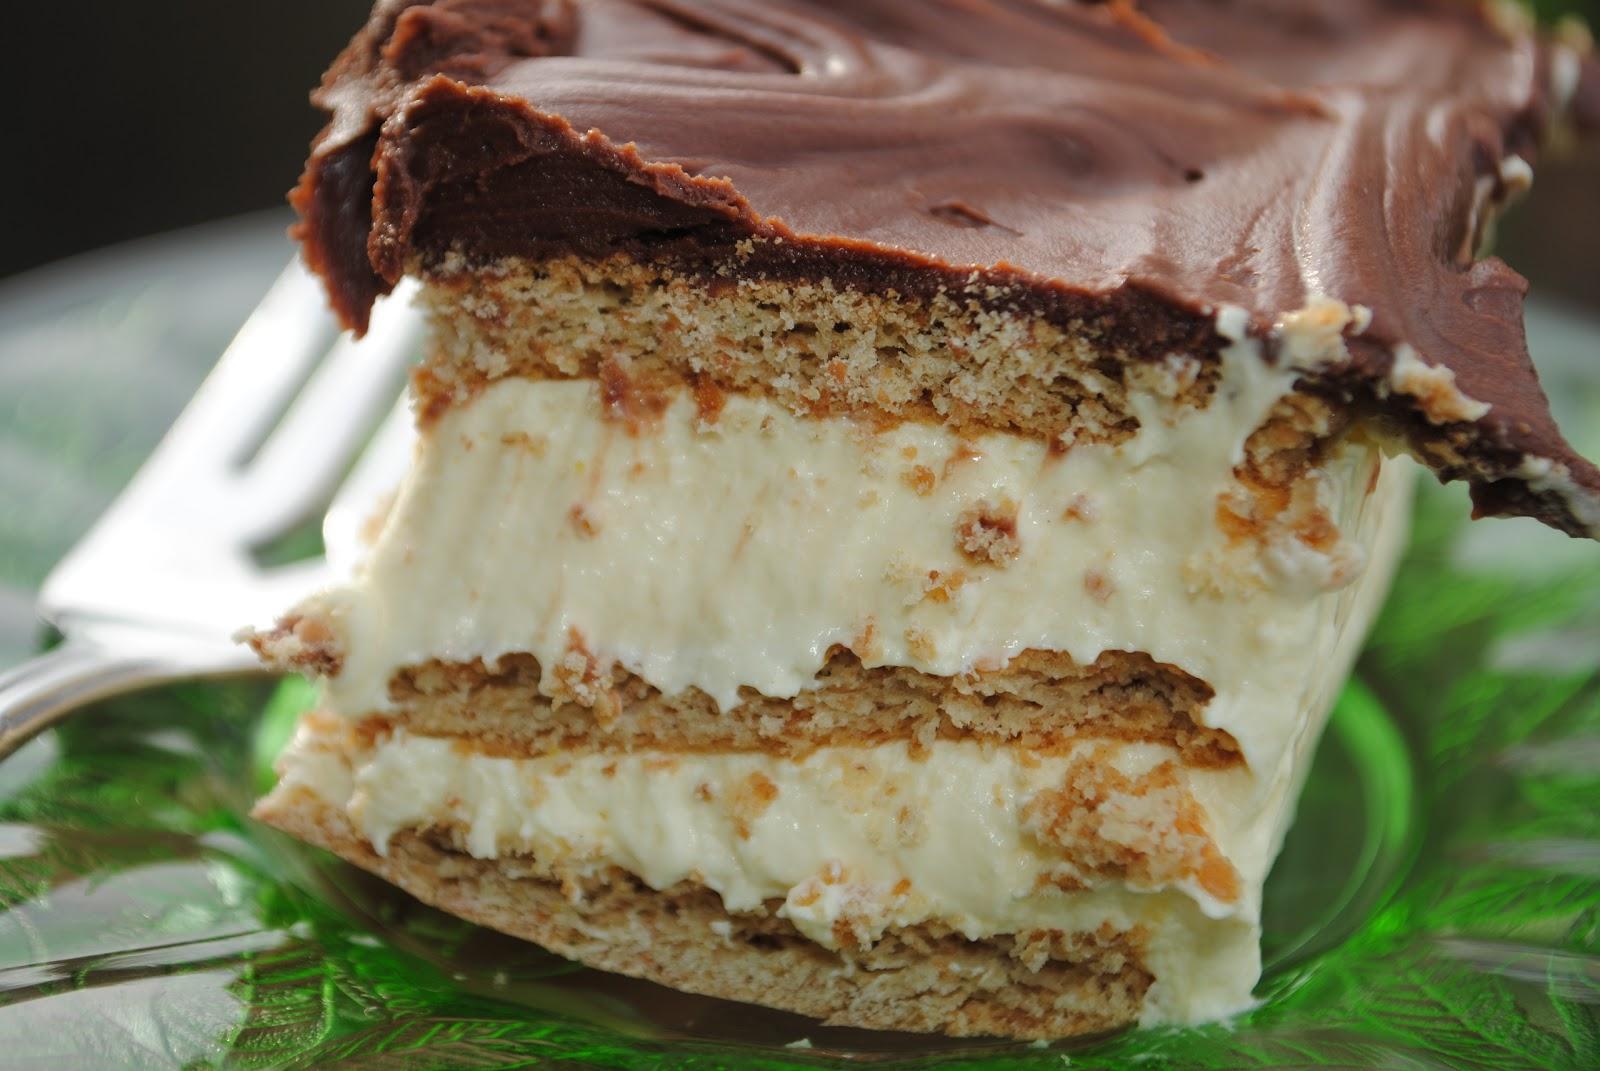 Shugary Sweets Chocolate Eclair Cake